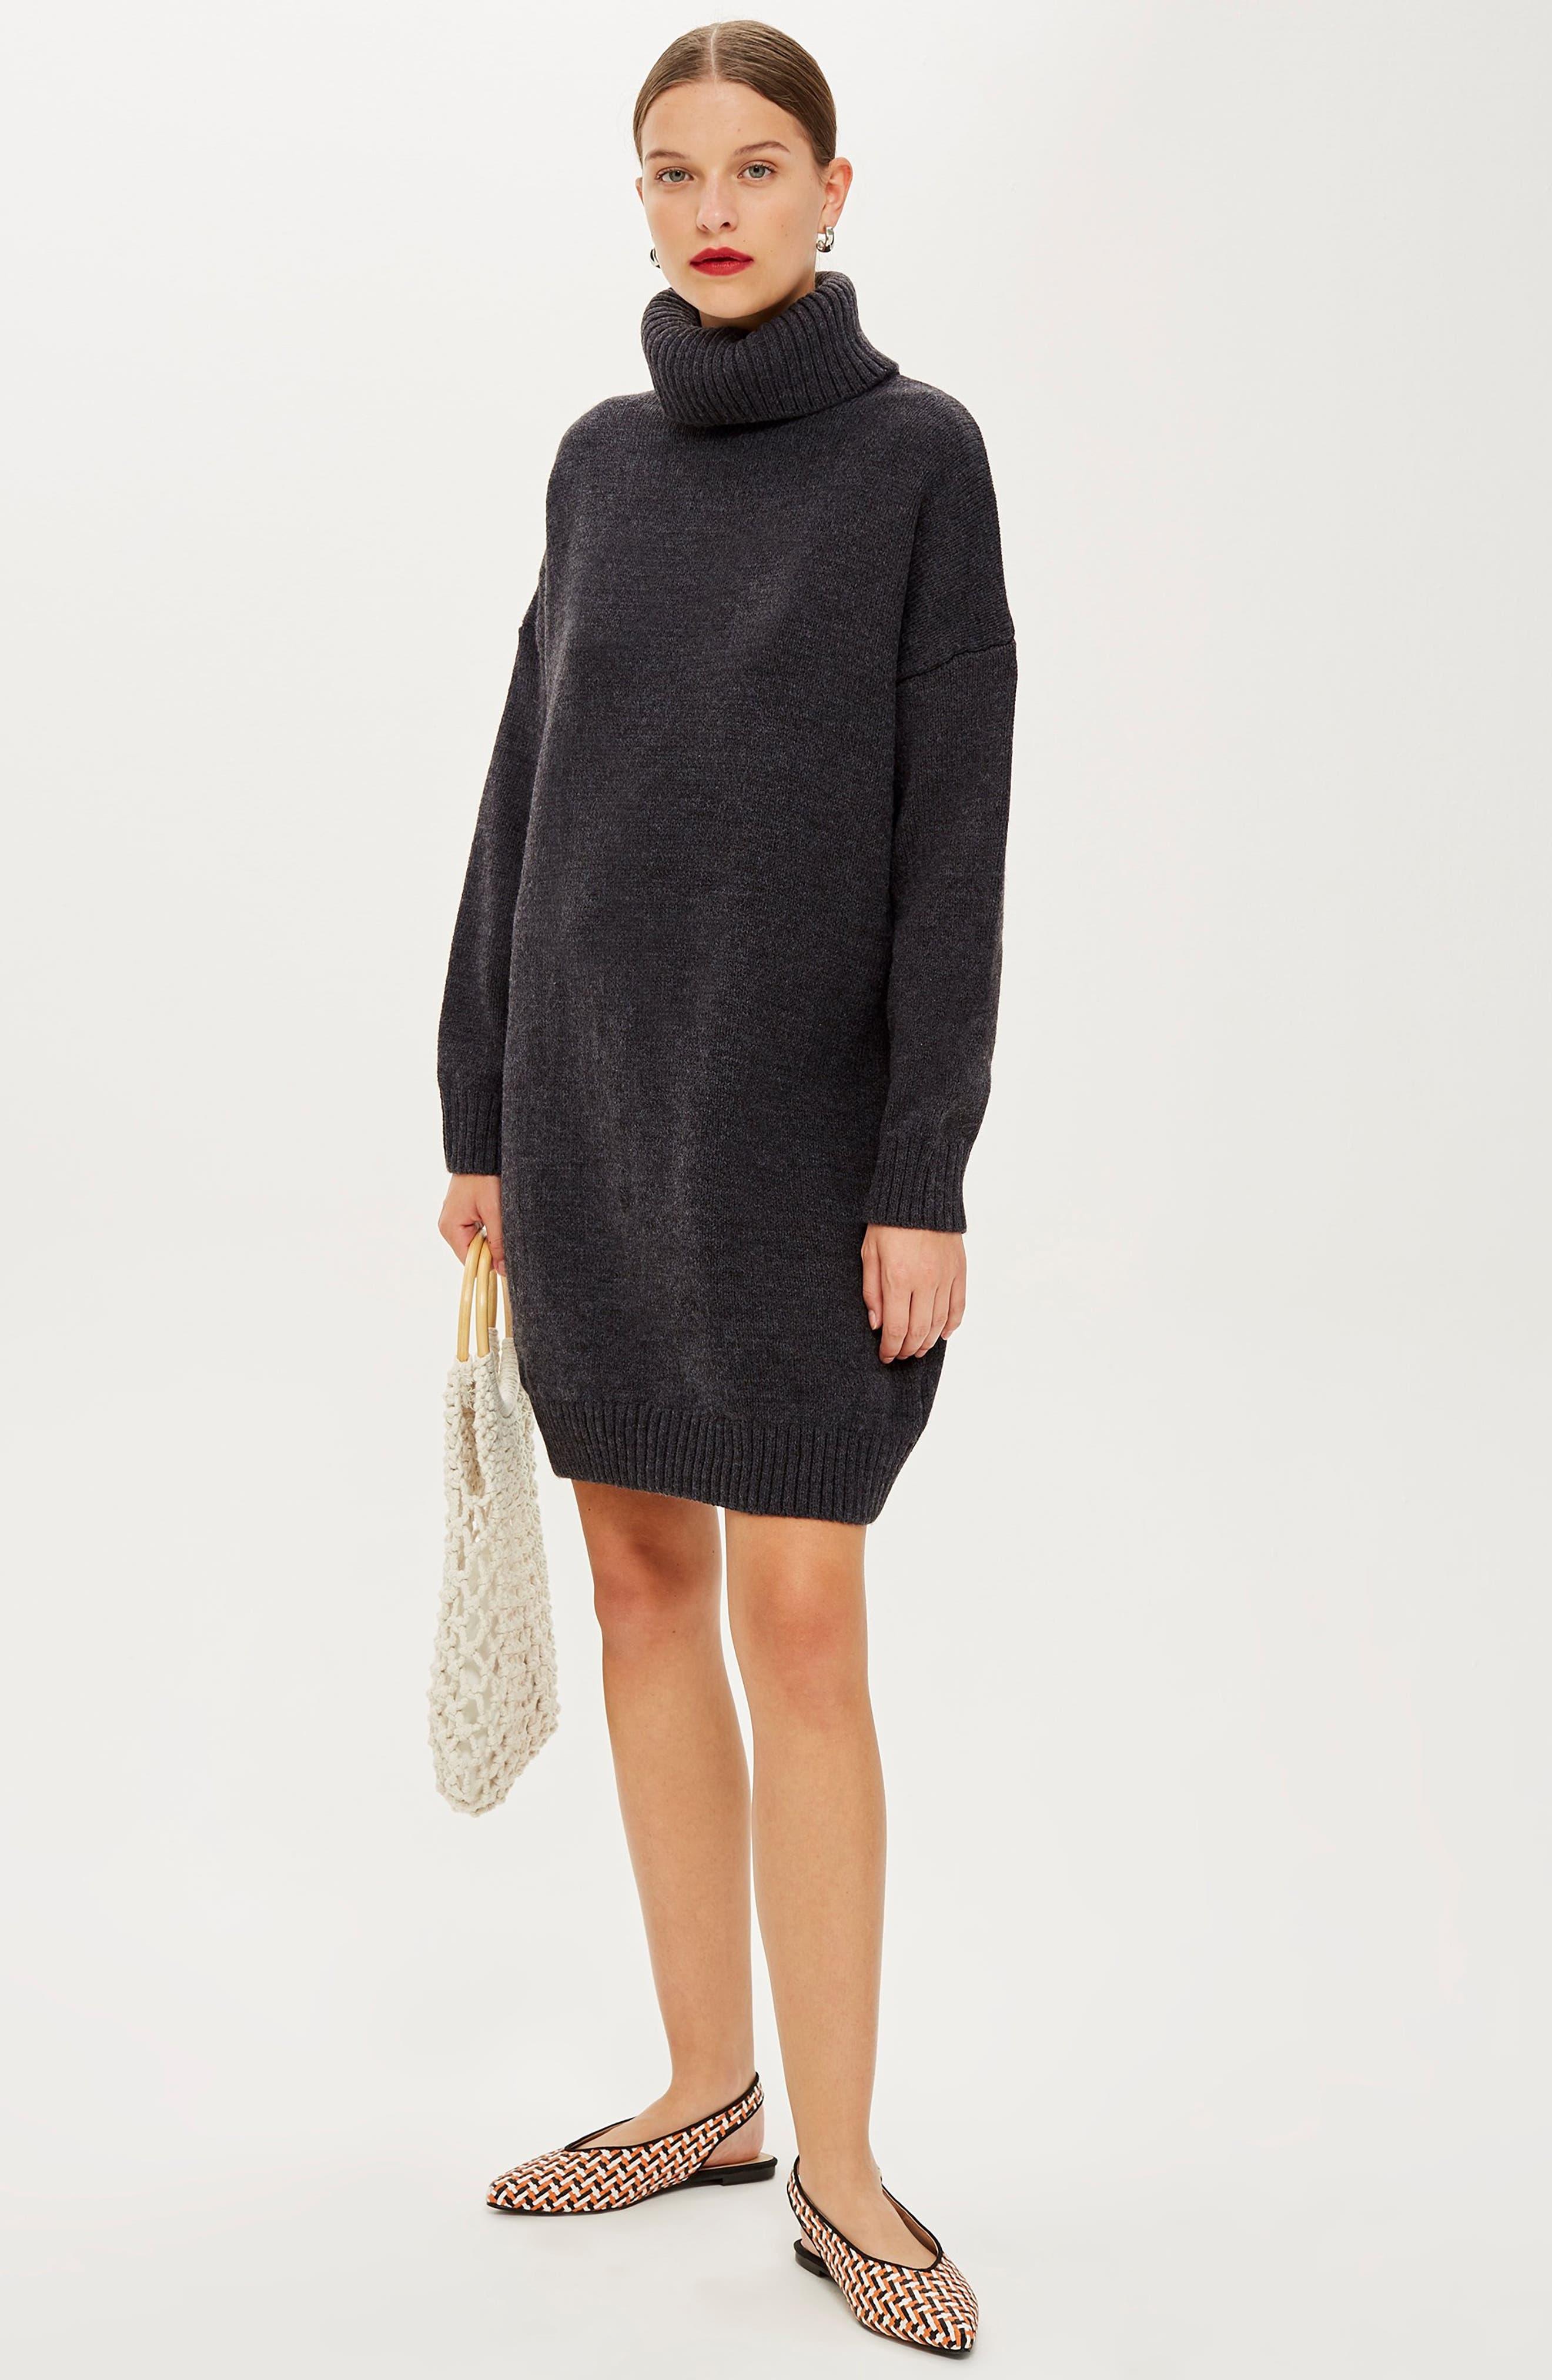 TOPSHOP, Turtleneck Sweater Dress, Alternate thumbnail 6, color, 021